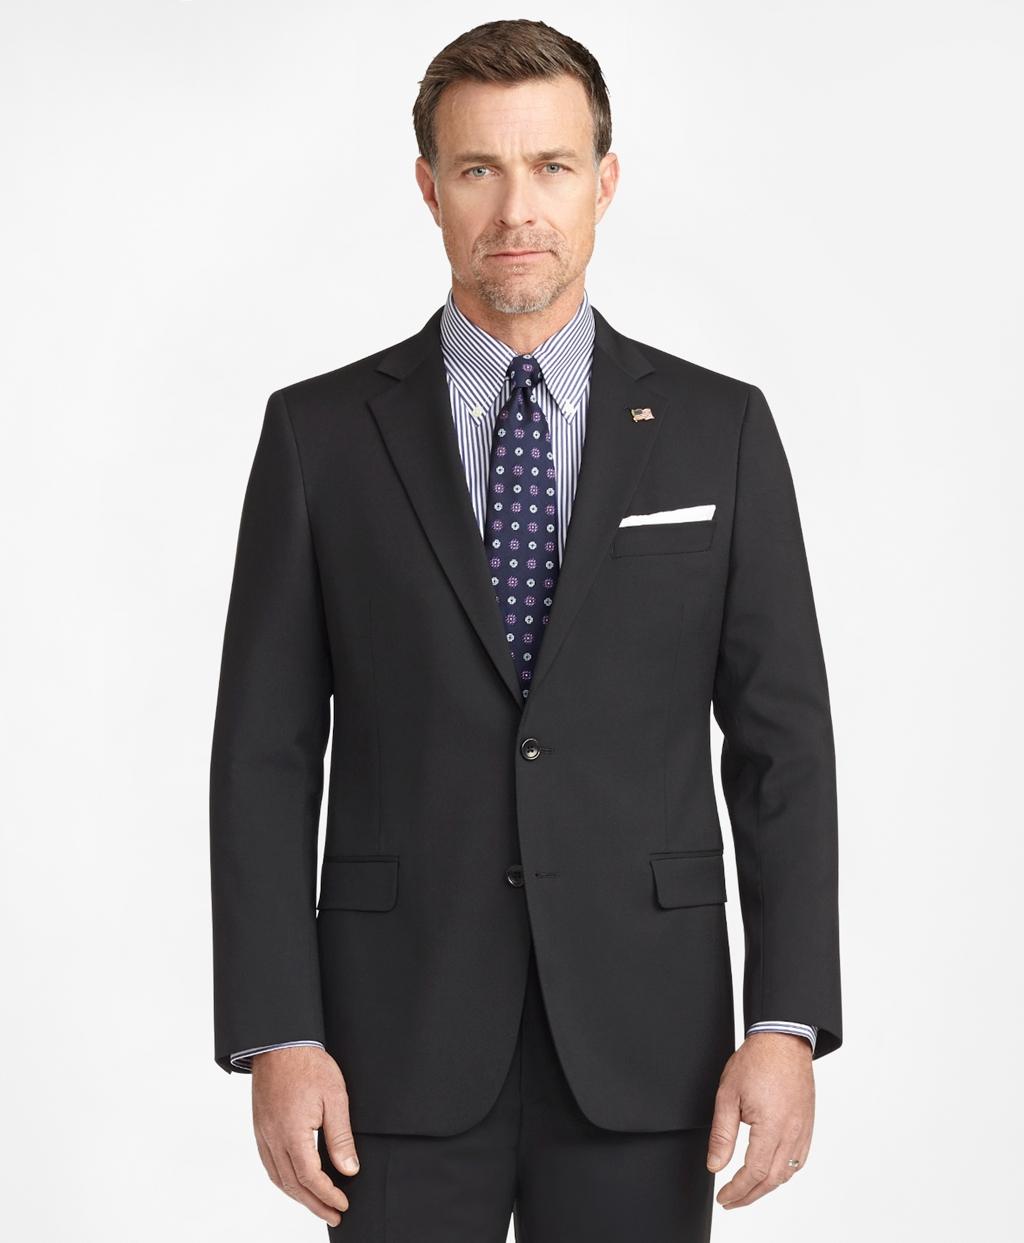 1024x1243 > Suit Wallpapers